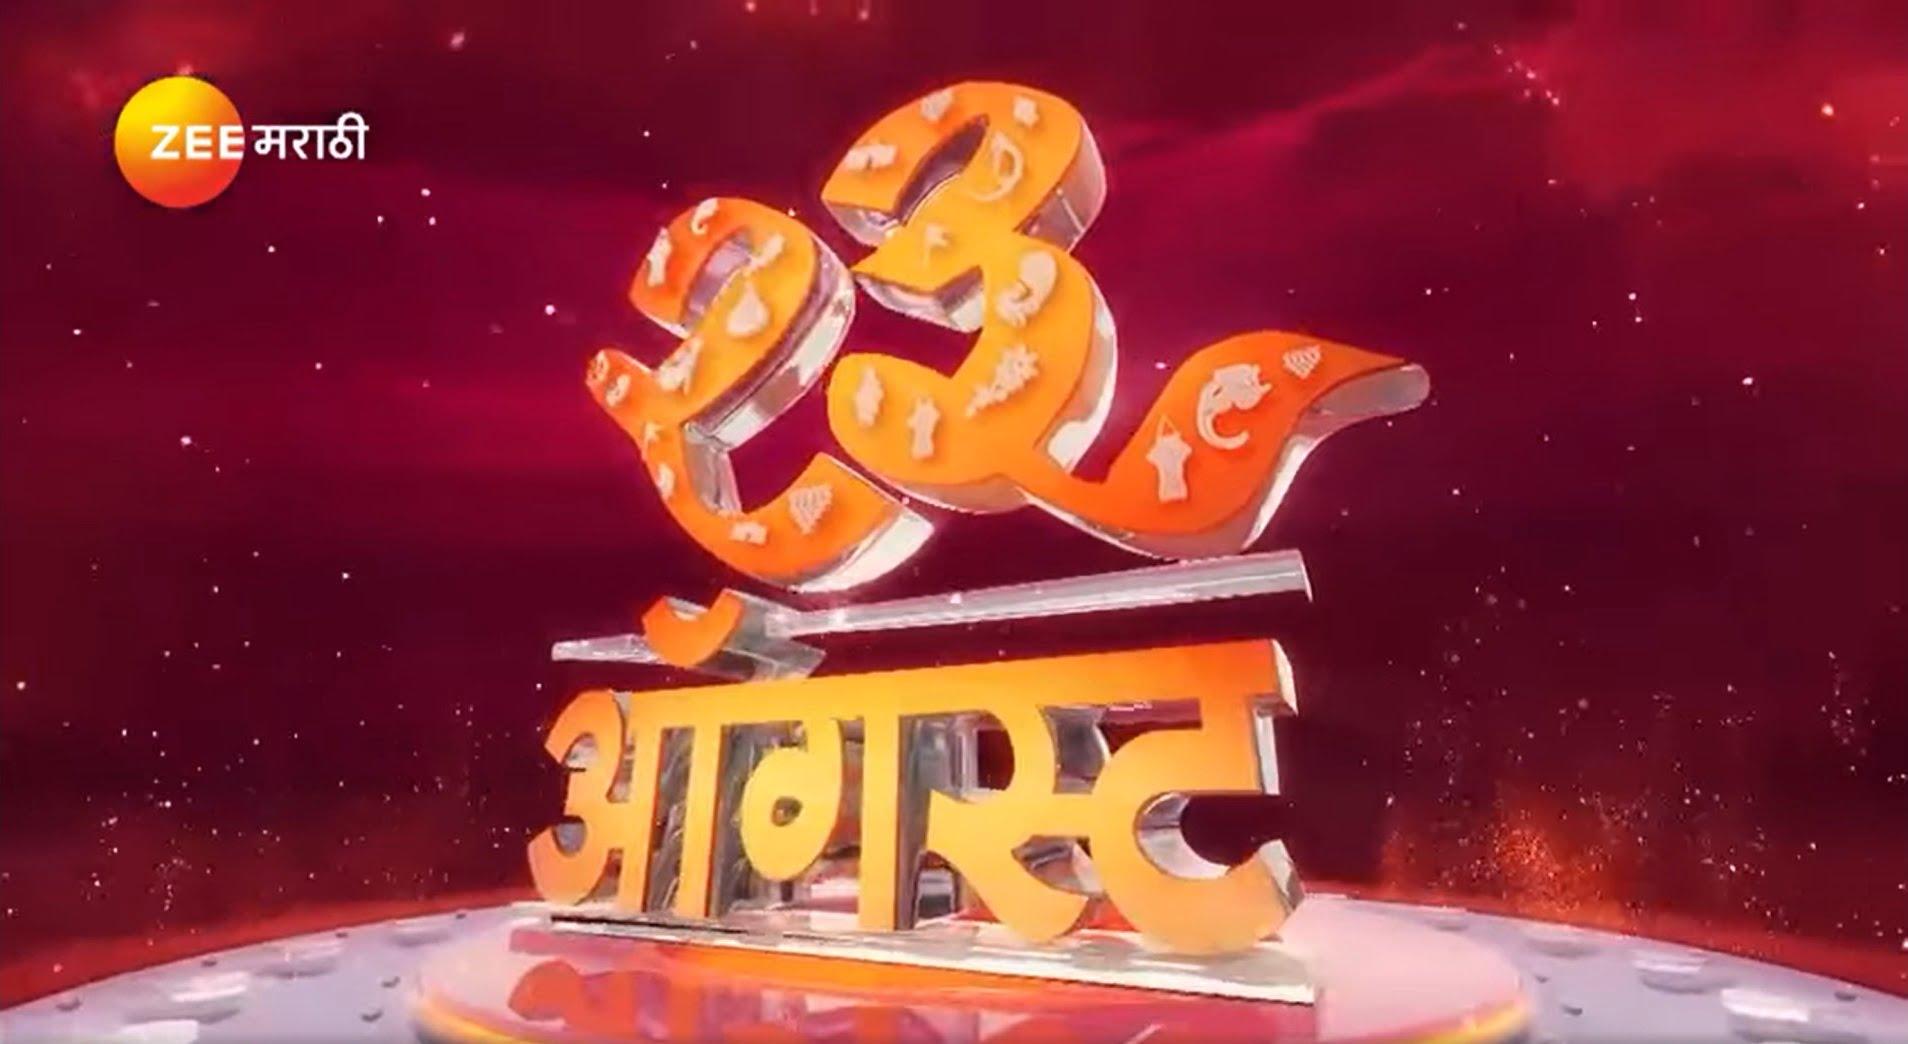 Zee Marathi 23 August Rebrand